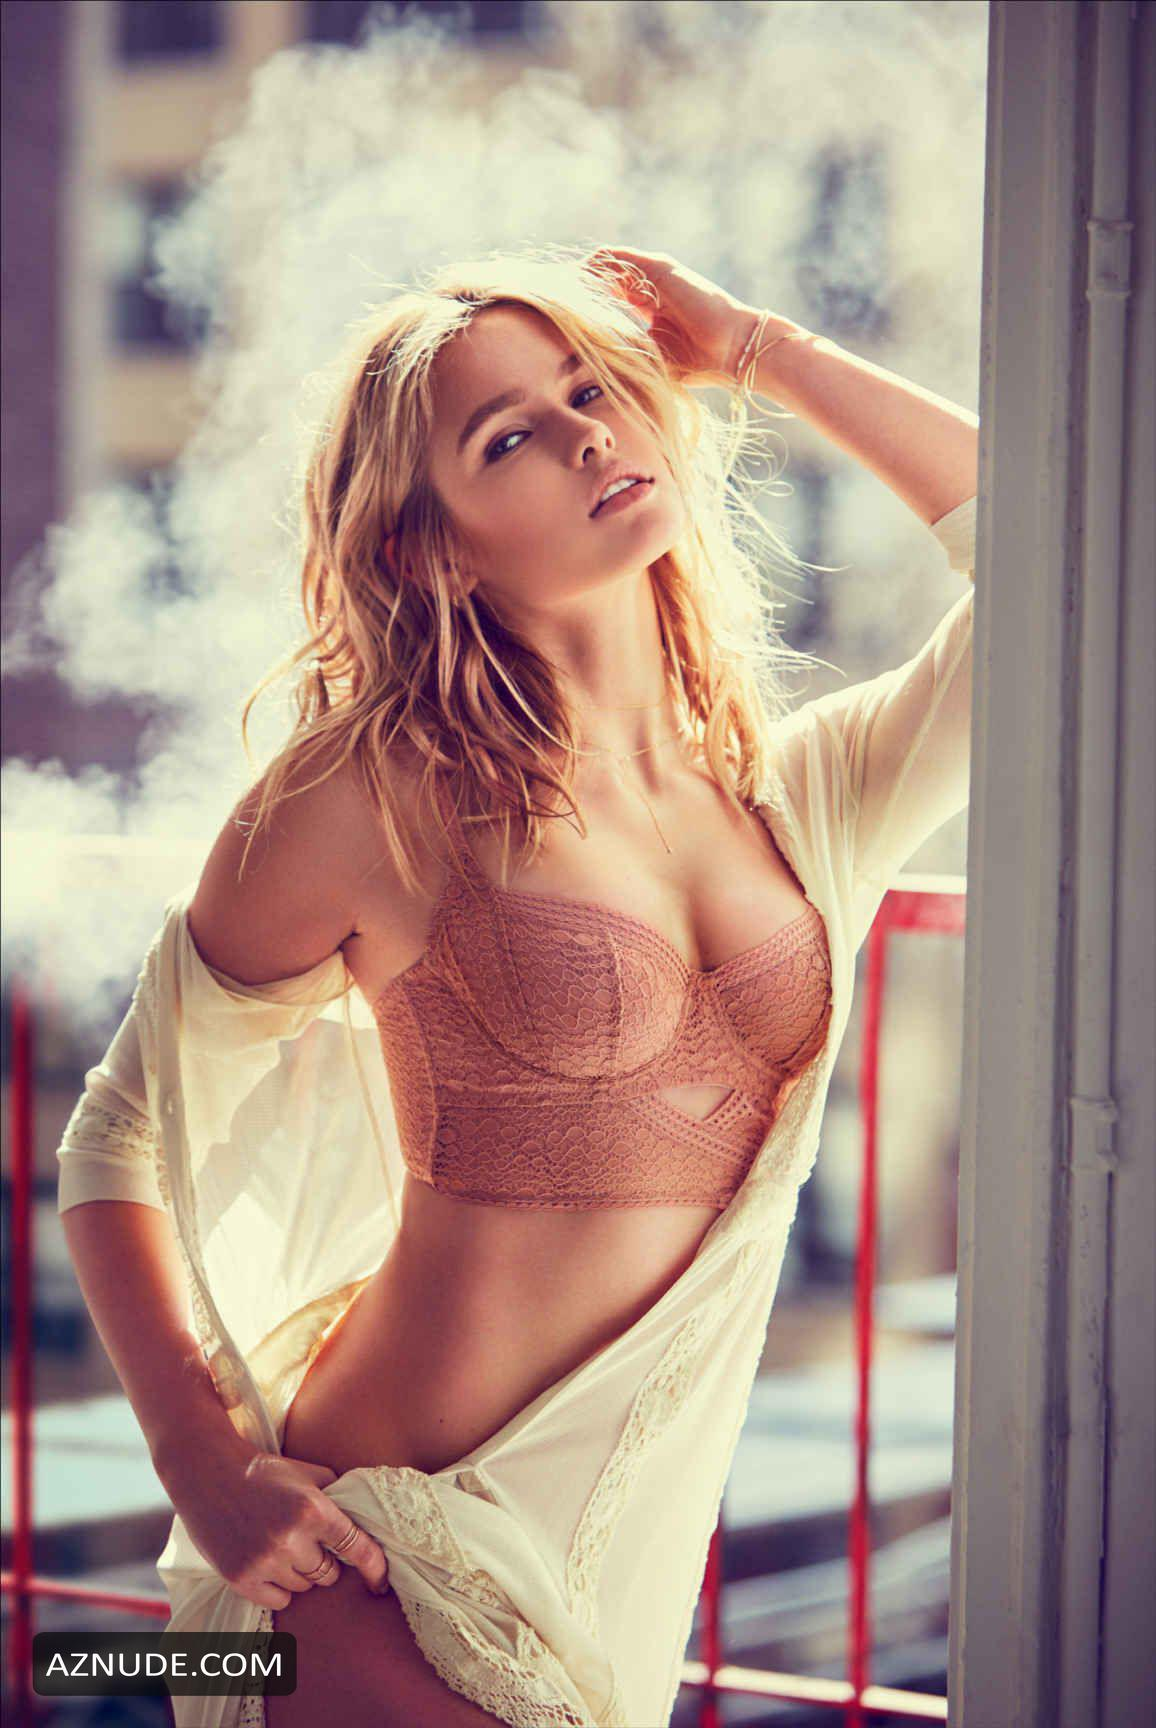 Nude Lada Kravchenko nudes (85 foto and video), Sexy, Sideboobs, Boobs, see through 2006